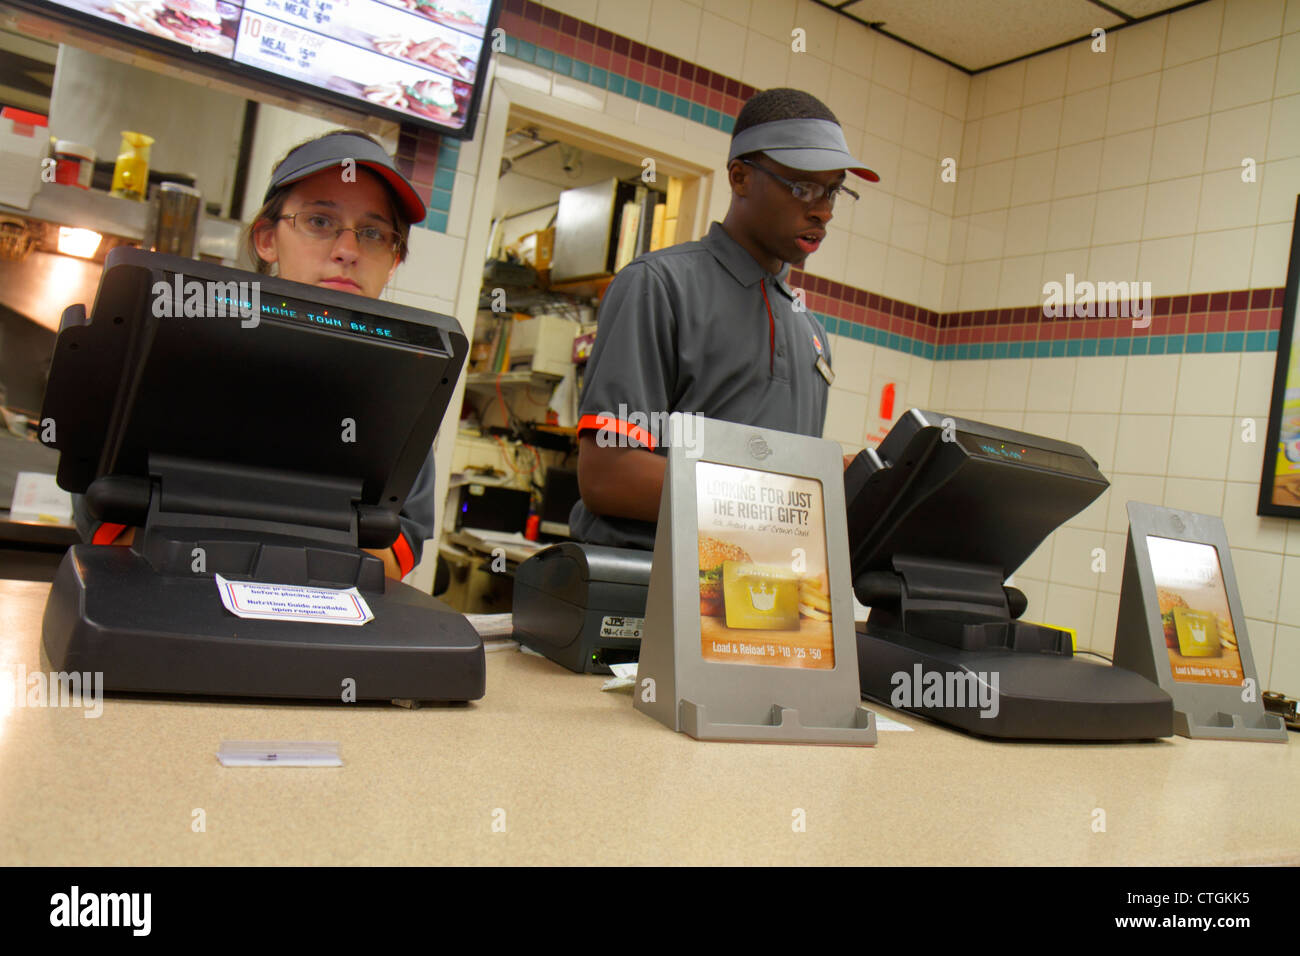 Port St. Lucie Florida Burger King fast food restaurant counter cashier woman Black man job service uniform - Stock Image